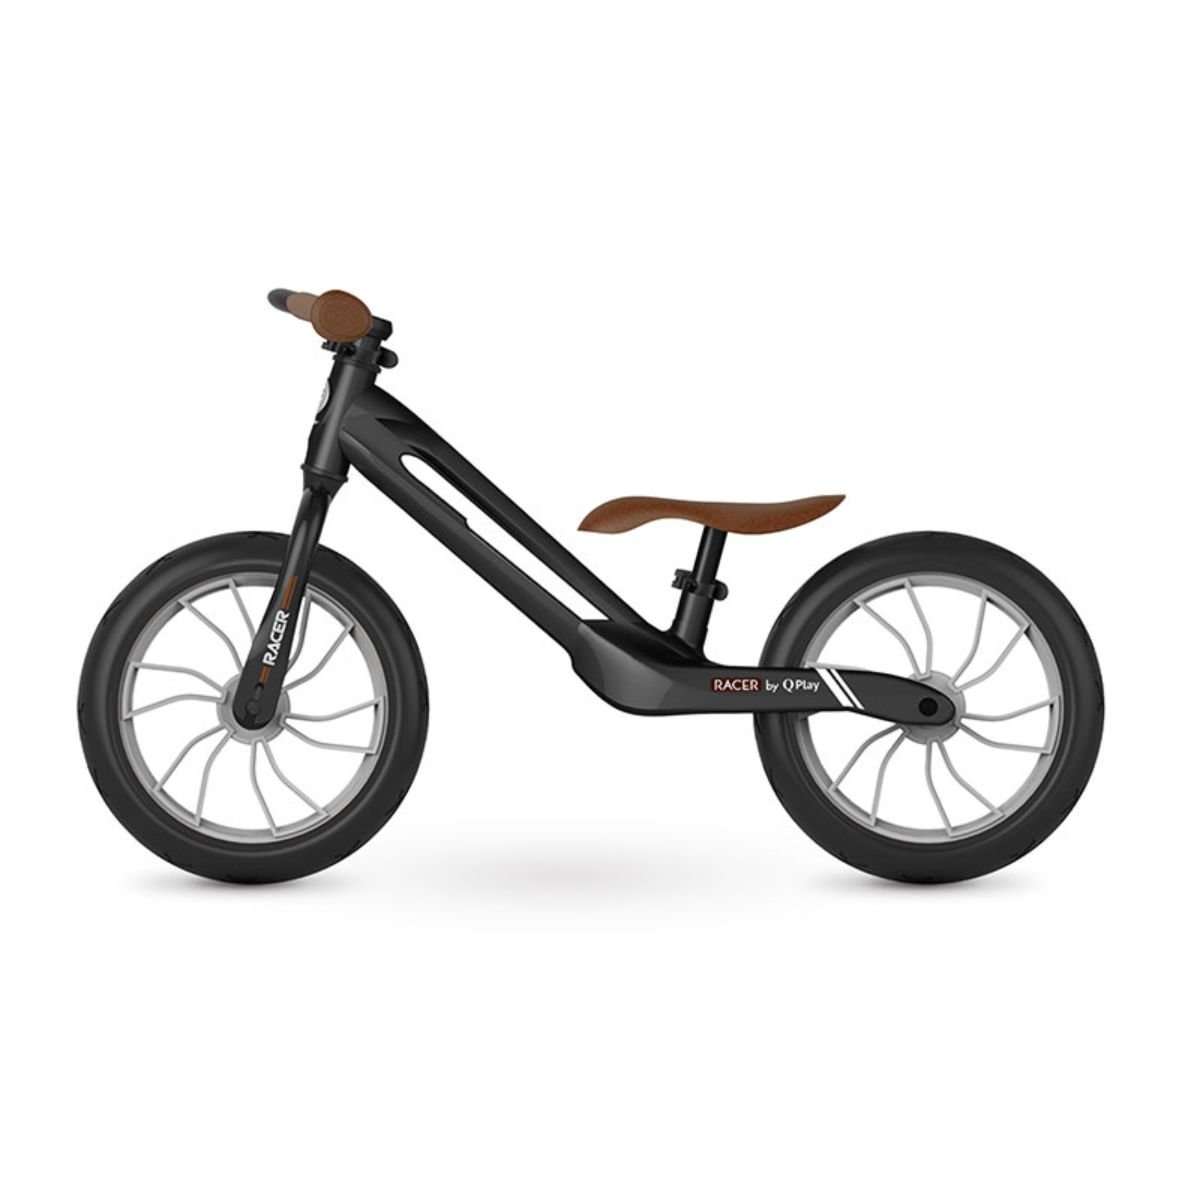 Bicicleta fara pedale DHS Baby Qplay Racer, Negru, 12 inch